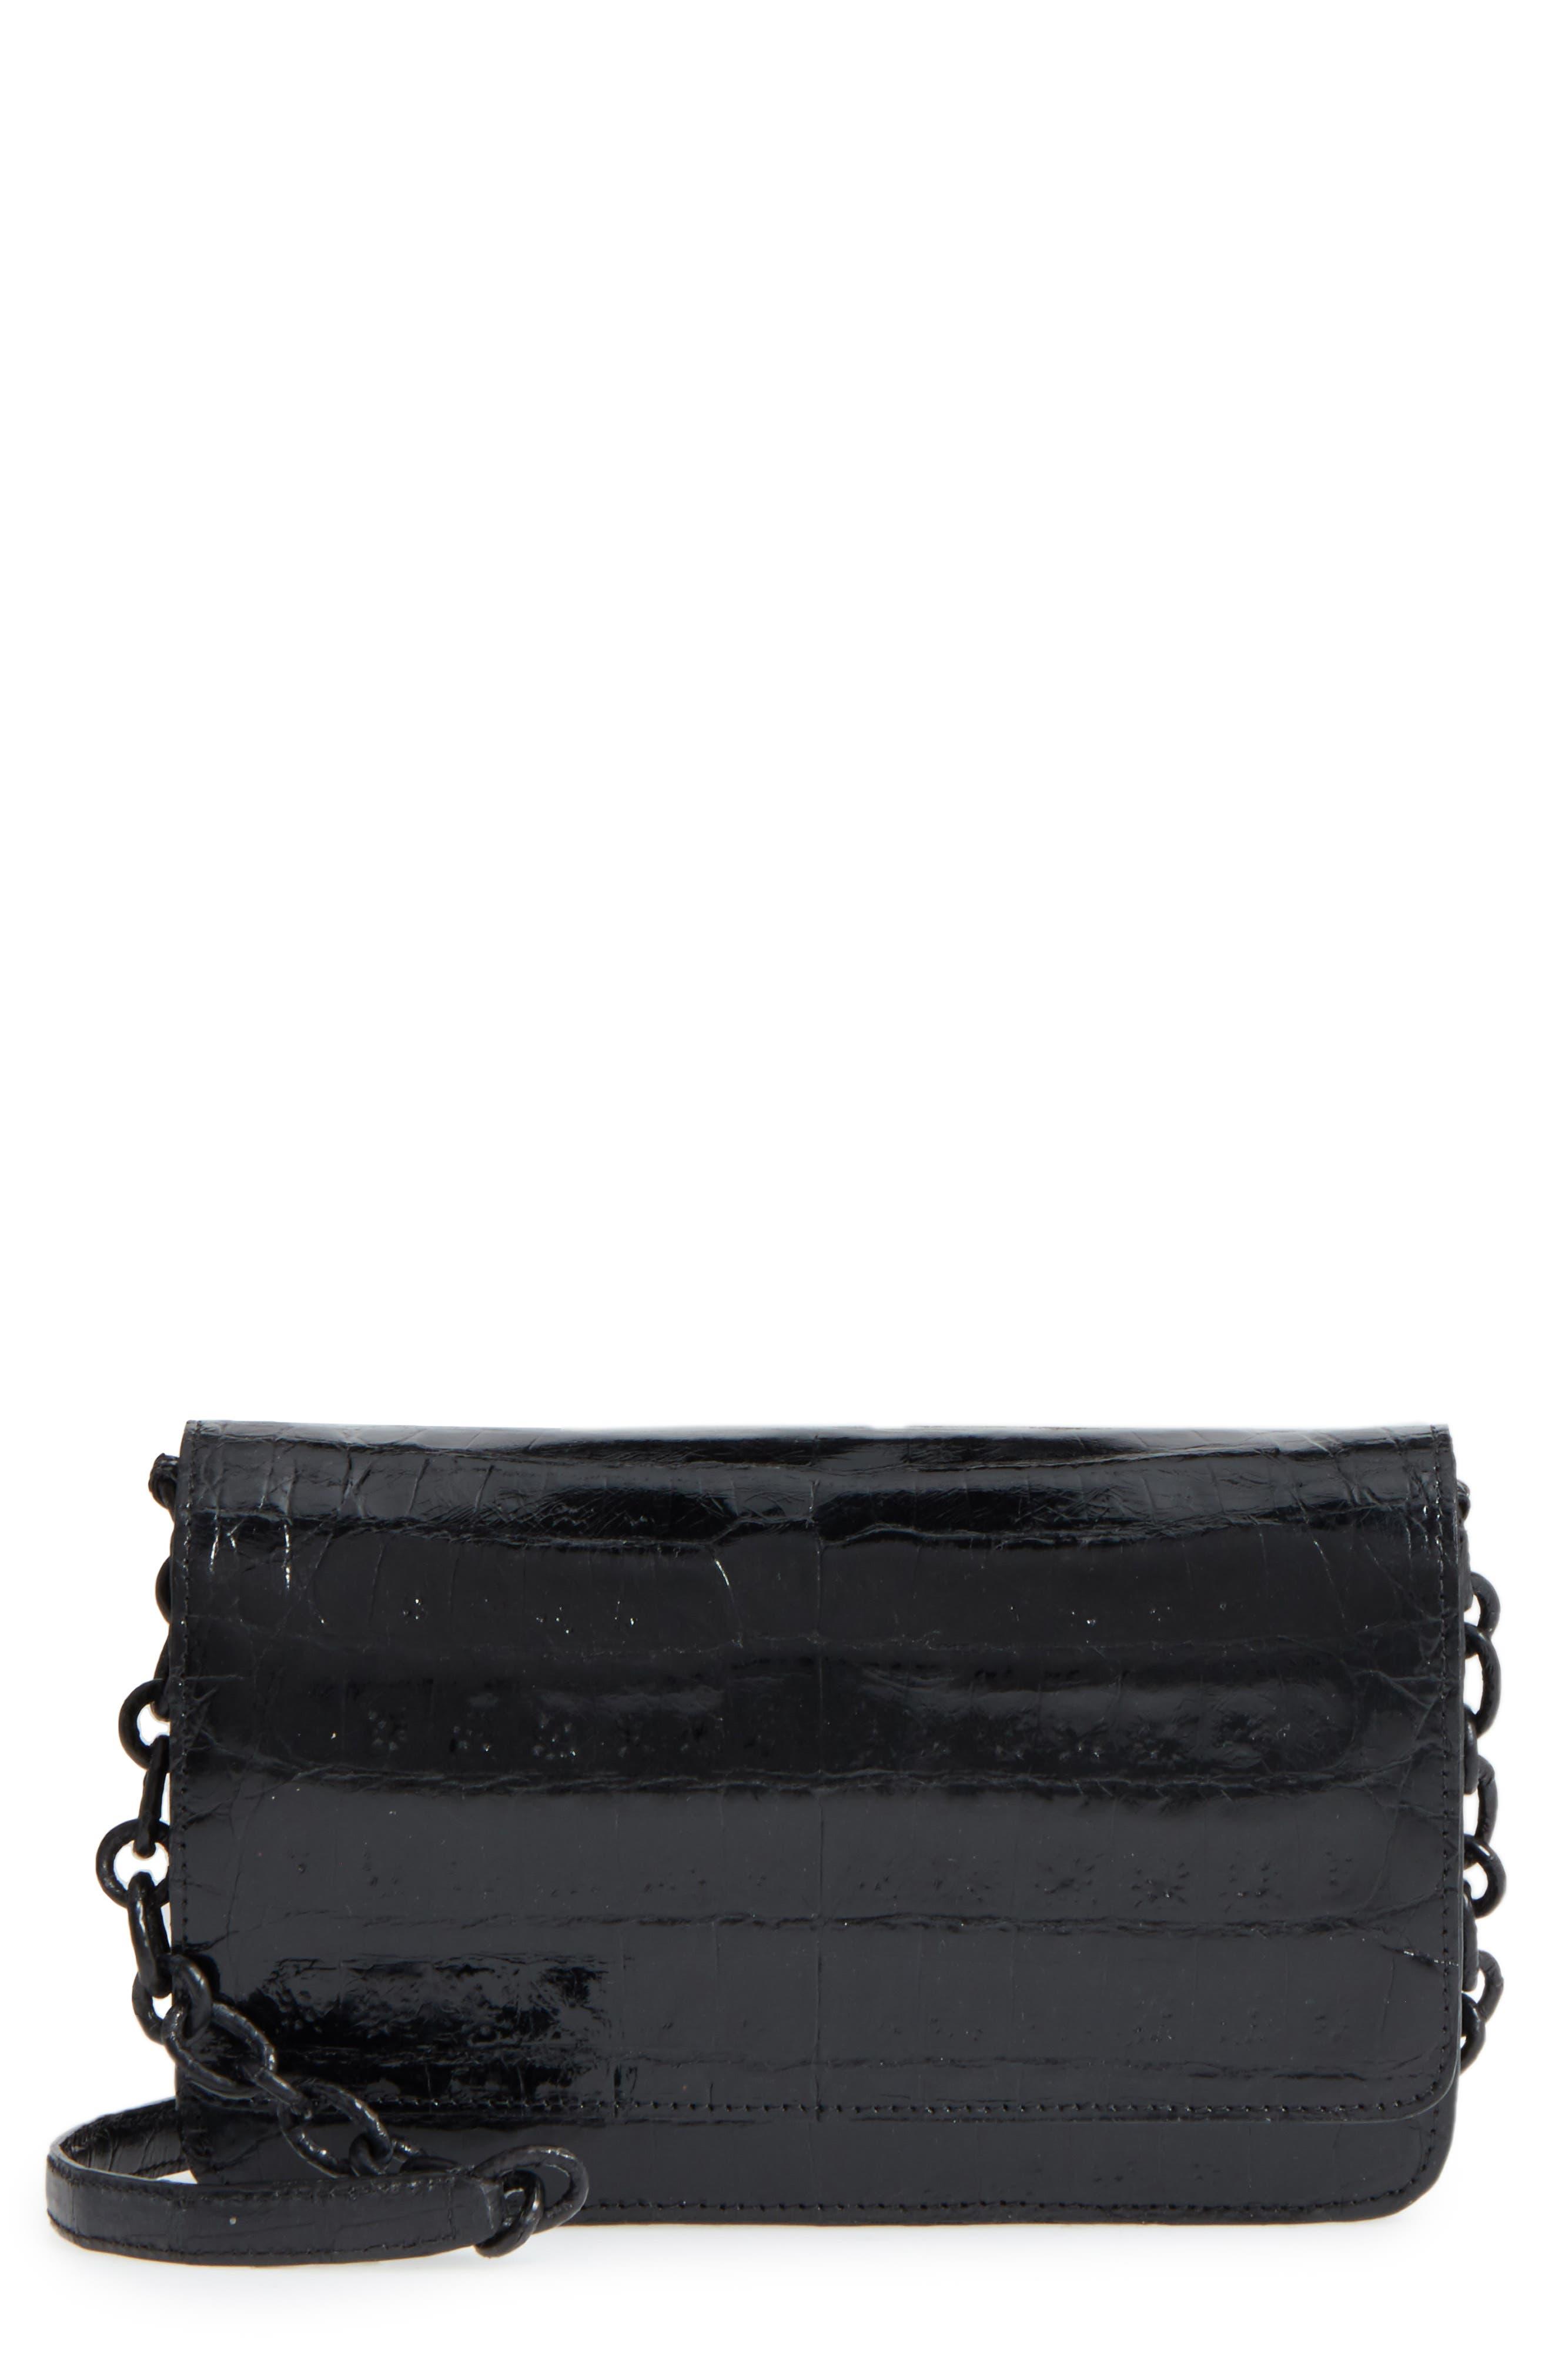 NANCY GONZALEZ Genuine Crocodile Wallet on a Chain, Main, color, BLACK SHINY